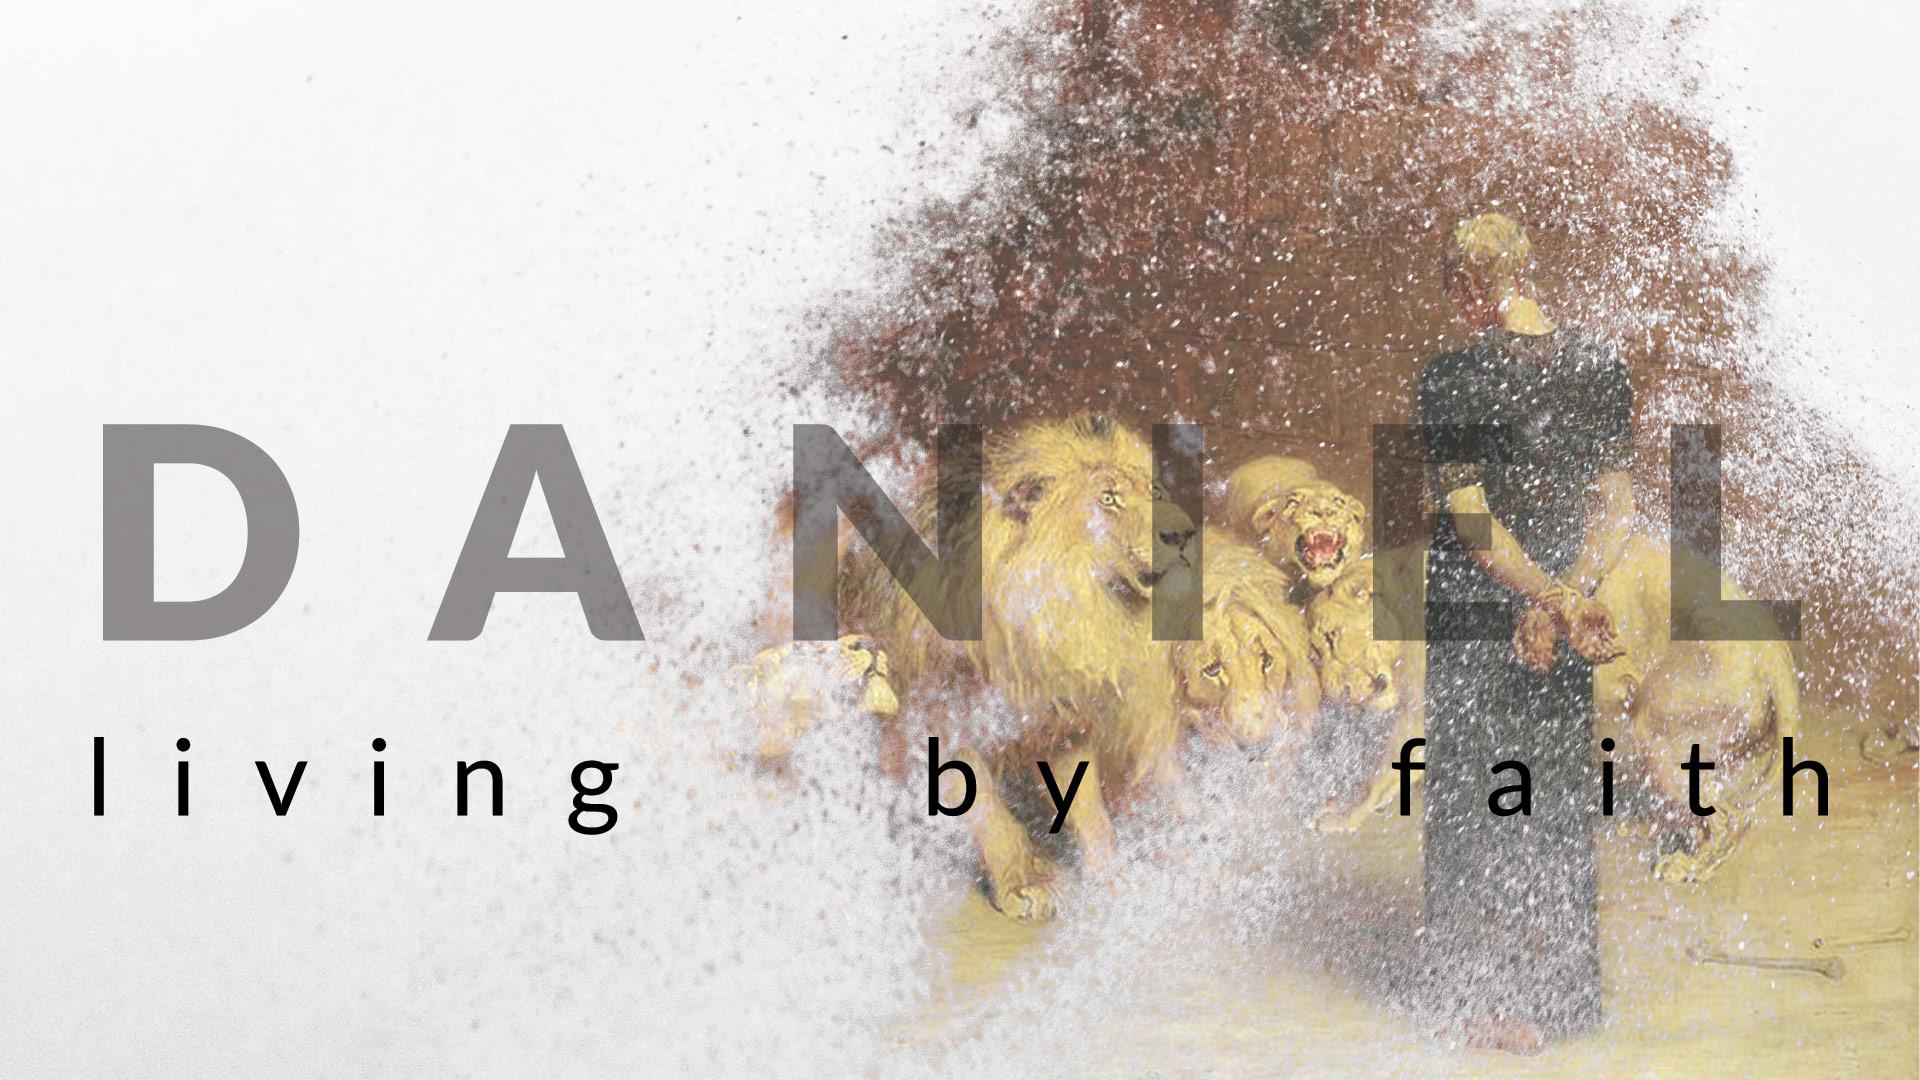 Daniel: Living by faith